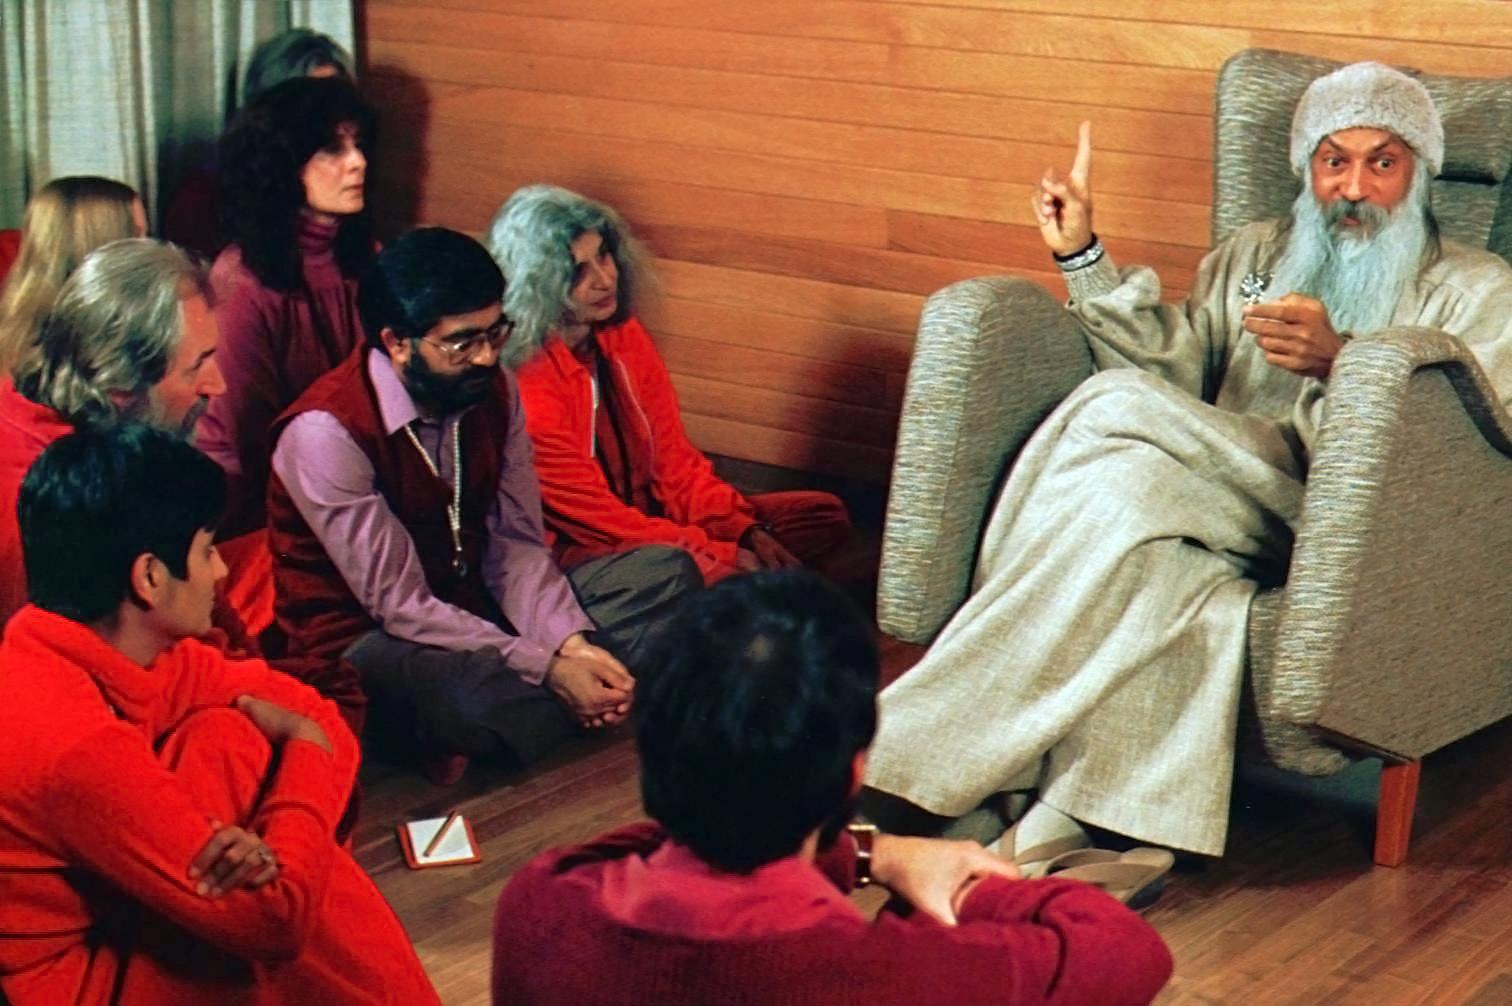 Bhagwan Shree Rajneesh, right, speaks with his disciples in Rajneeshpuram,  Oregon.